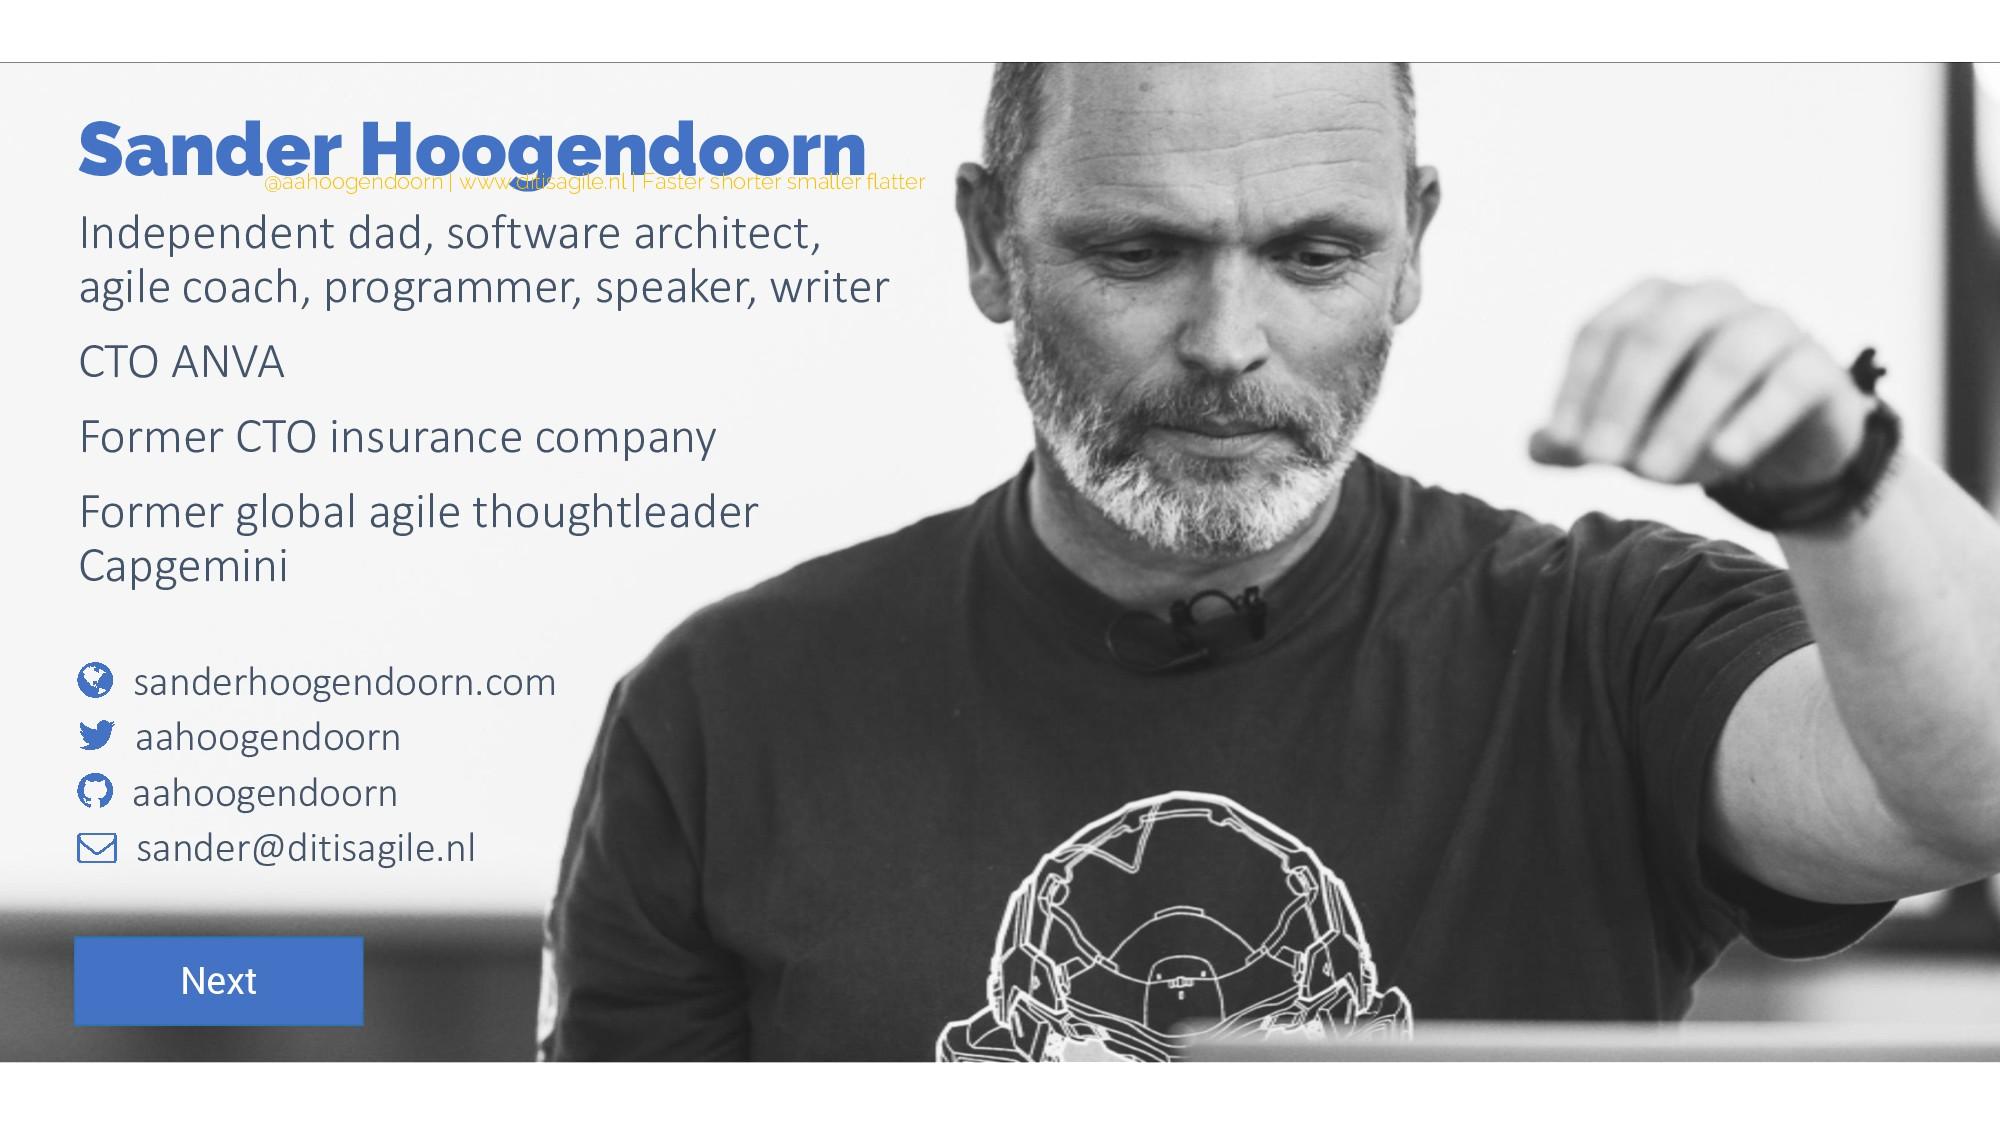 Sander Hoogendoorn Independent dad, software ar...